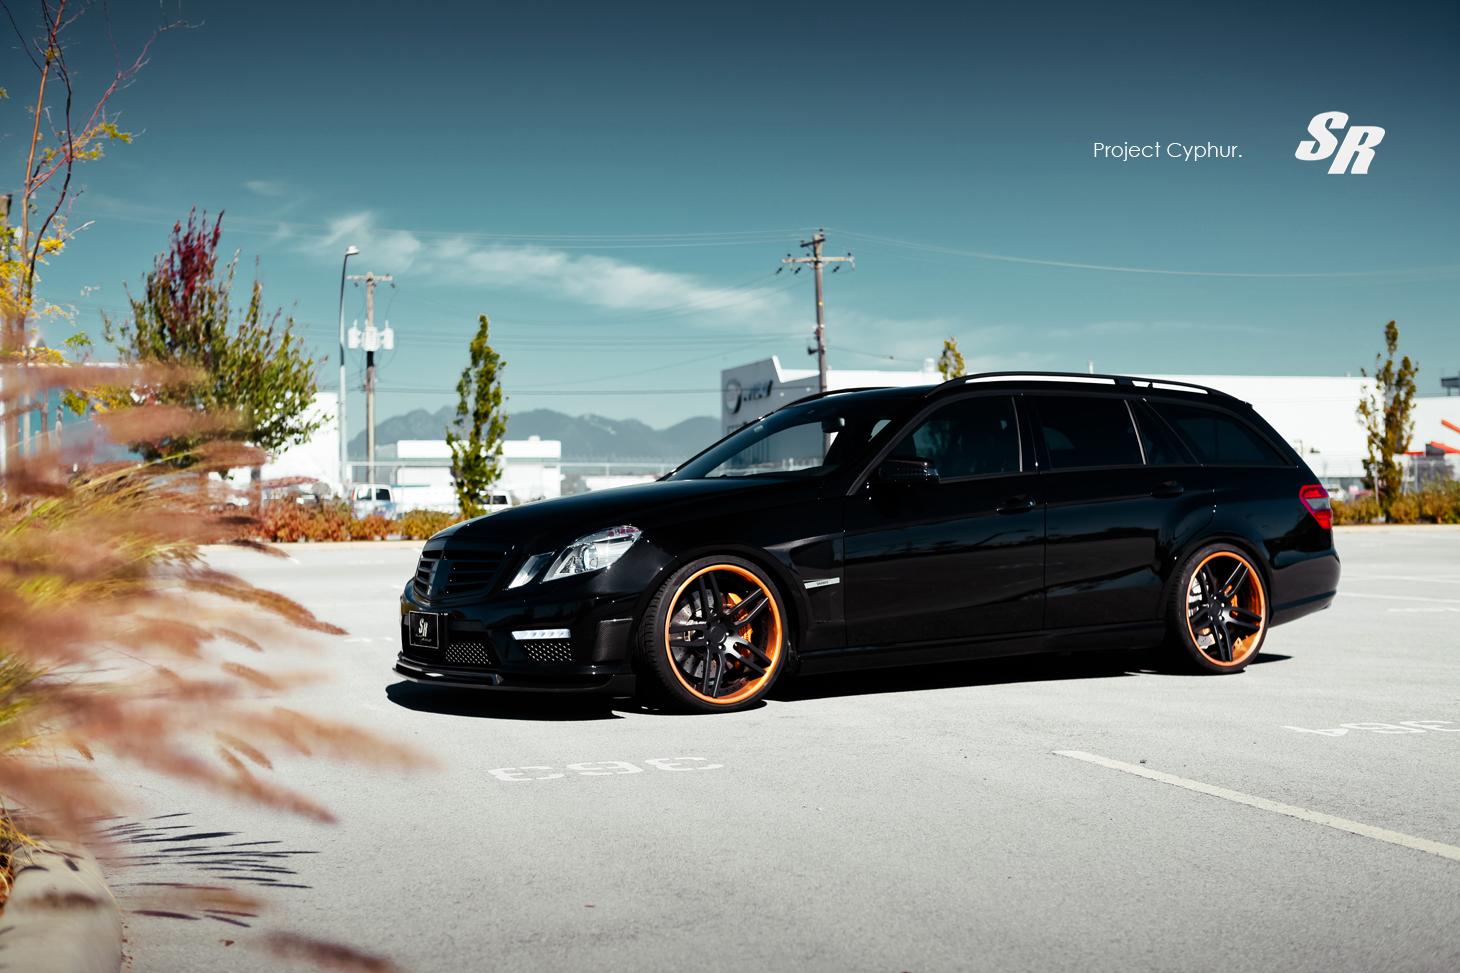 E63 Amg Wagon >> SR Auto Mercedes-Benz E63 AMG - Project Cyphur